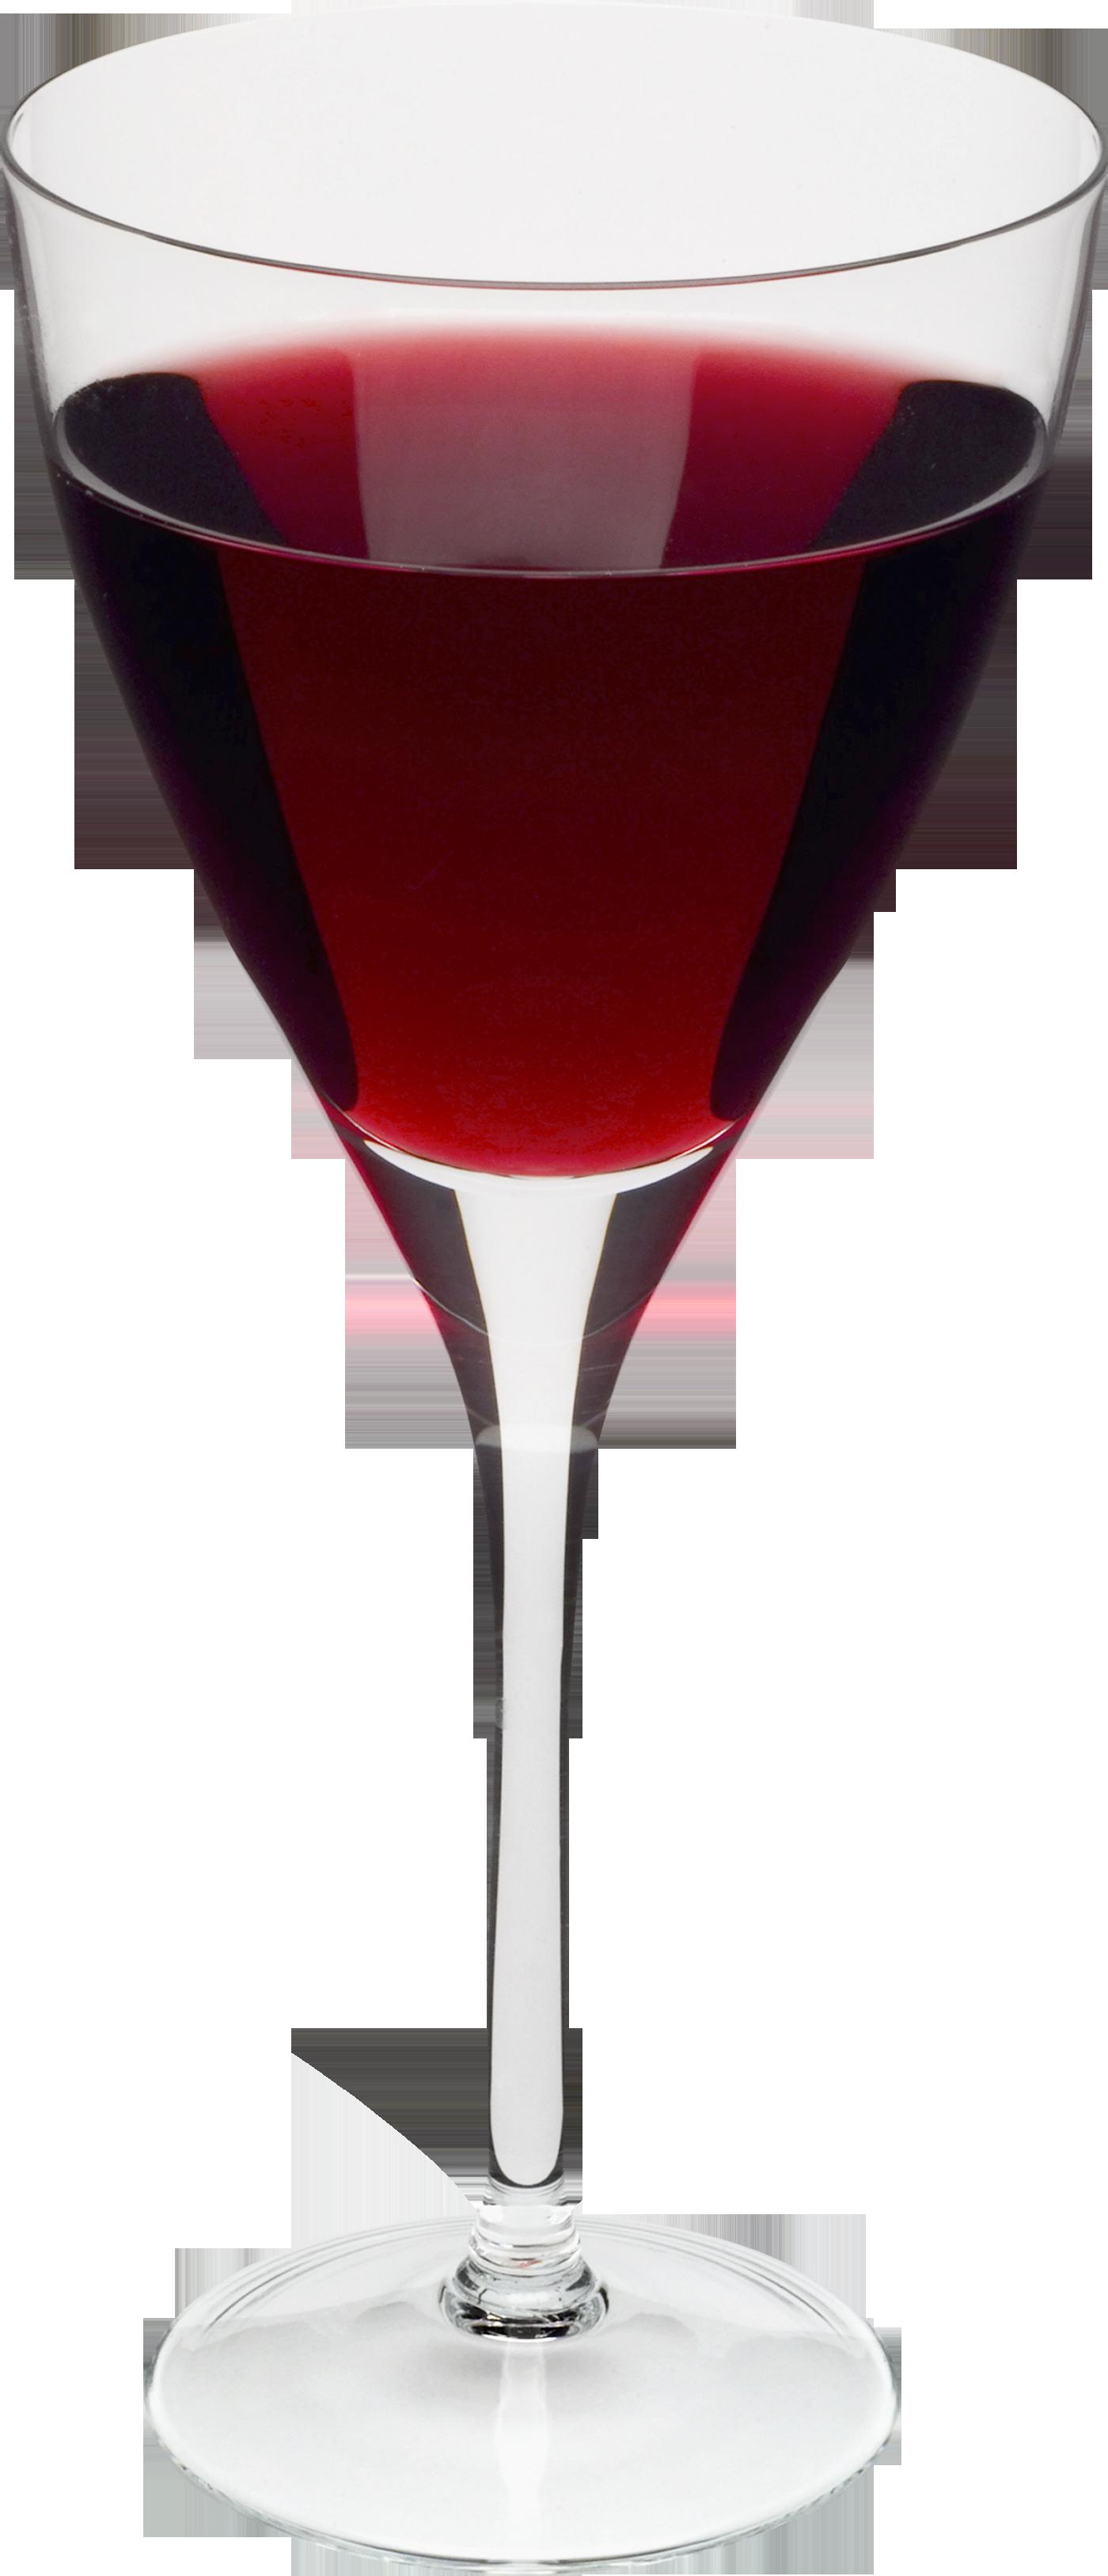 Clipart wine glass